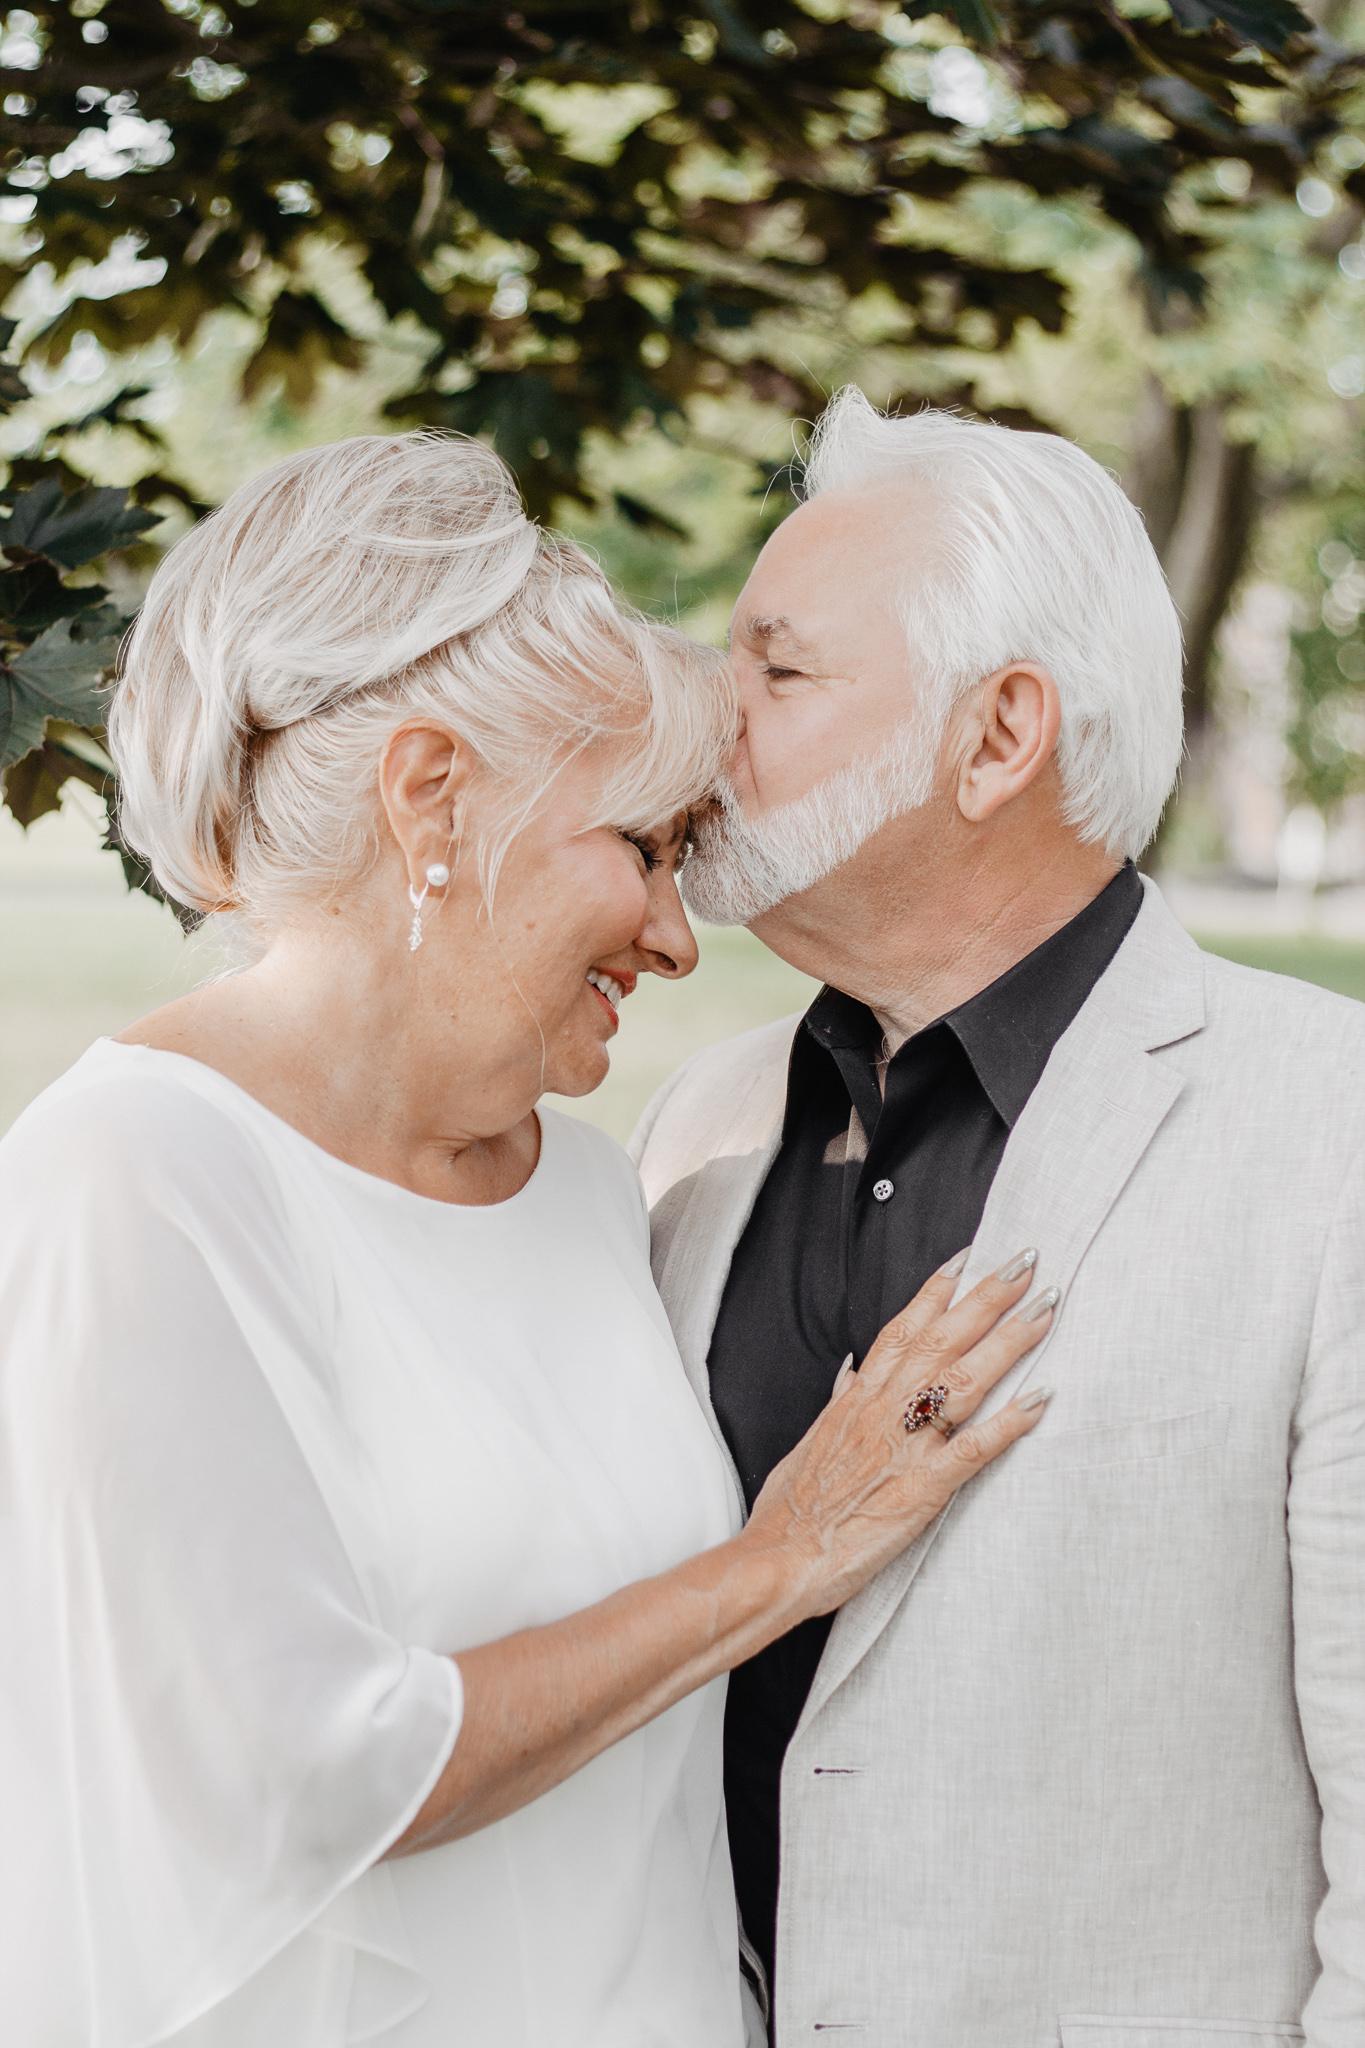 Dennis + Deb | Anniversary | Ohio Wedding + Engagement Photographer | Catherine Milliron Photography